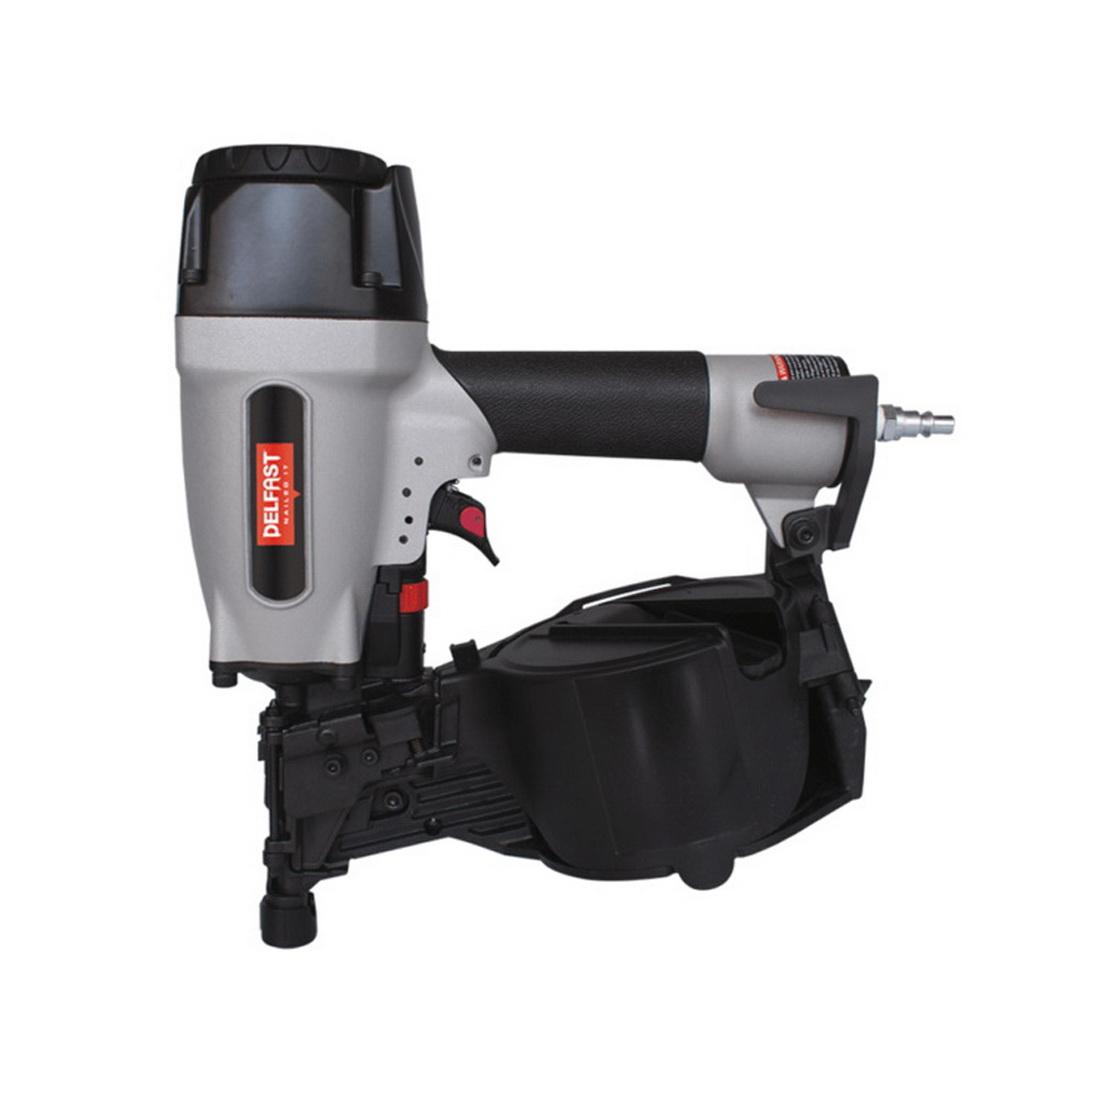 Smartnail & AC Series 65mm Coil Nailer